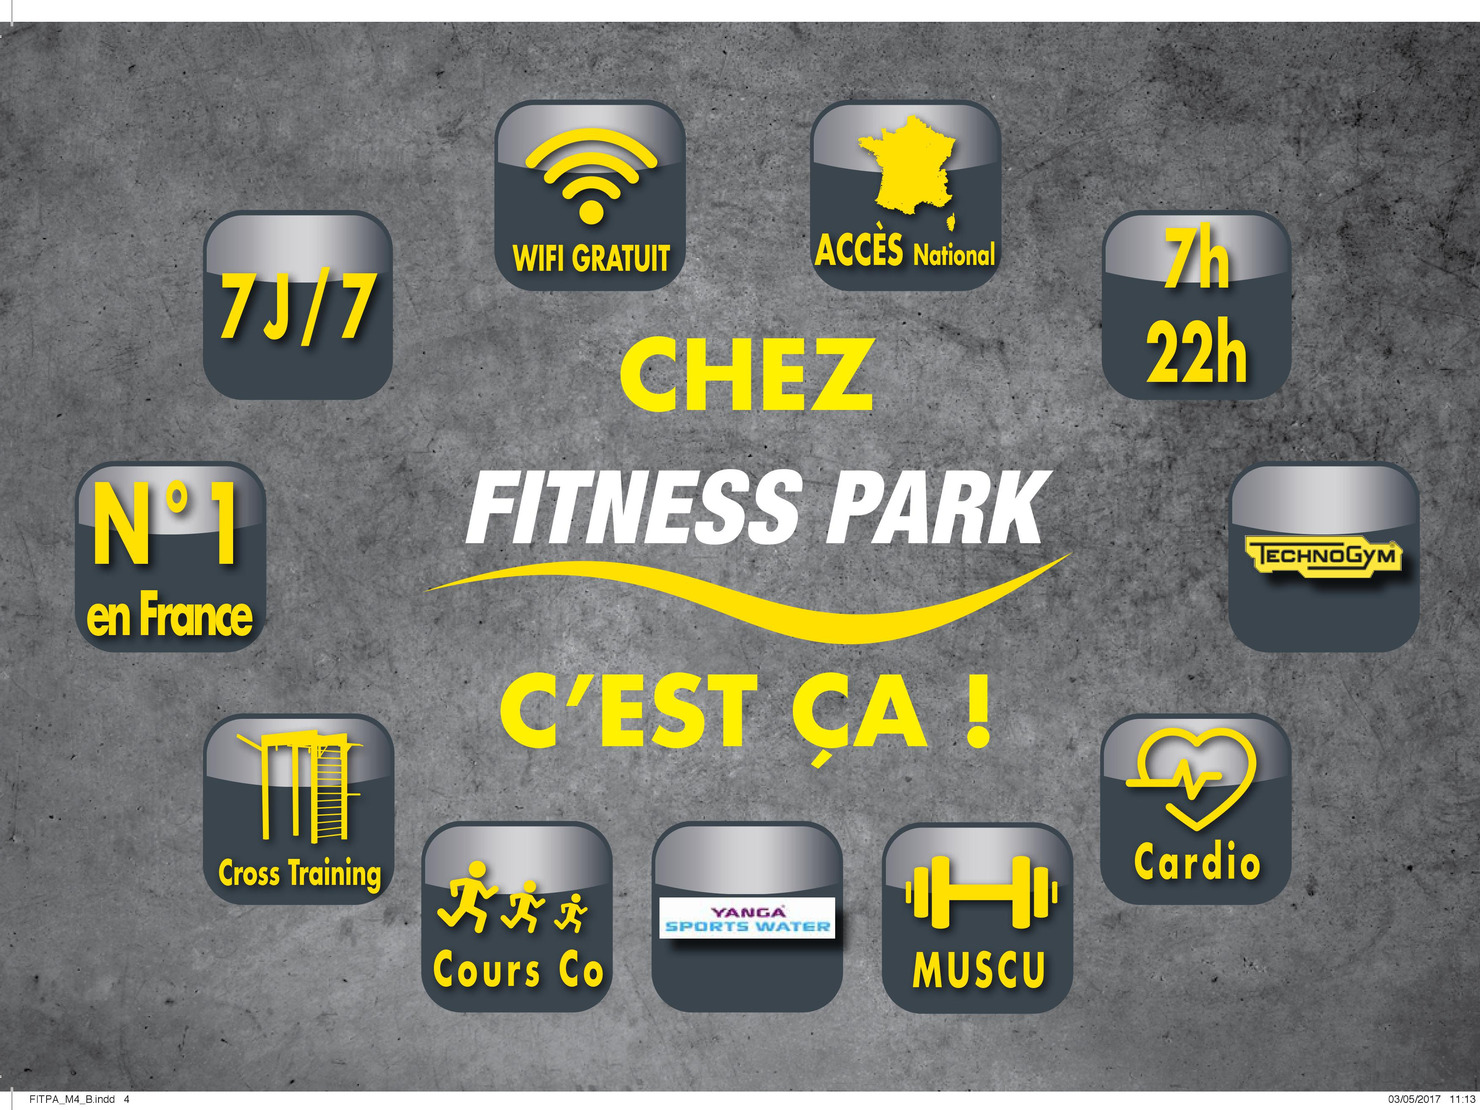 fitness park strasbourg mittelhausbergen tarifs avis horaires essai gratuit. Black Bedroom Furniture Sets. Home Design Ideas